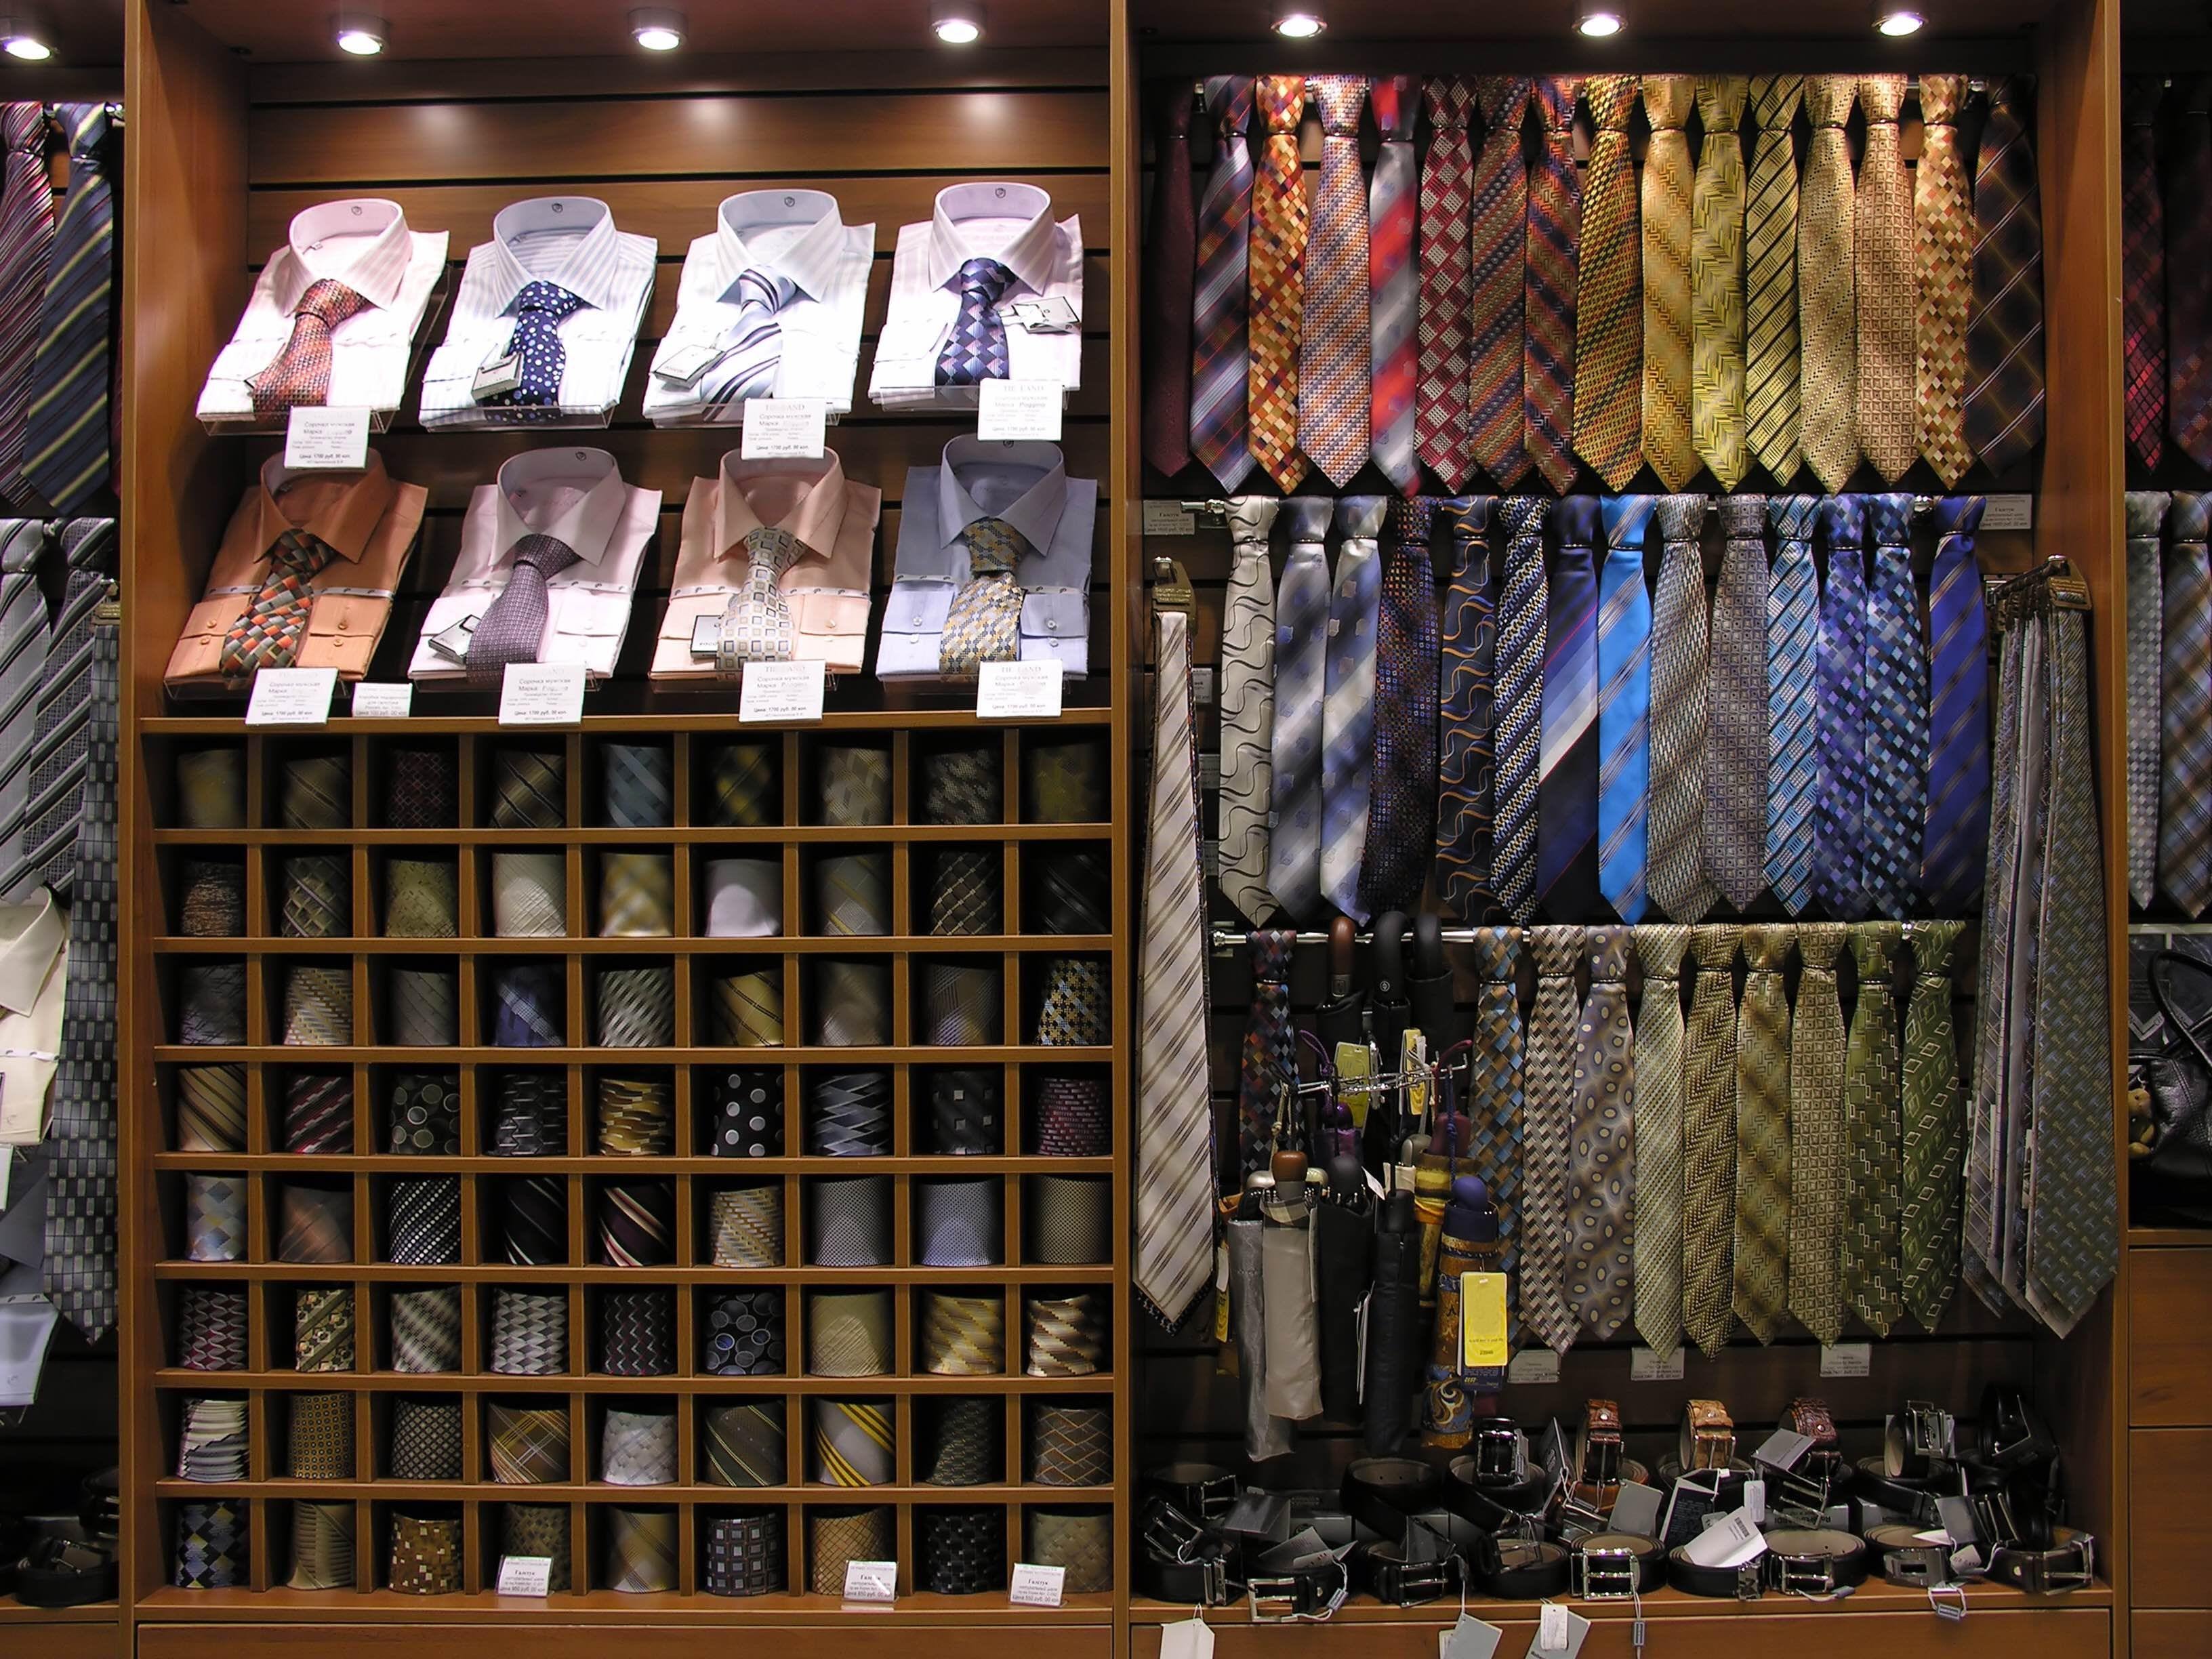 Mens Shoe Closet fabulous-mens-closet-shoe-organizer (3264×2448) | visual